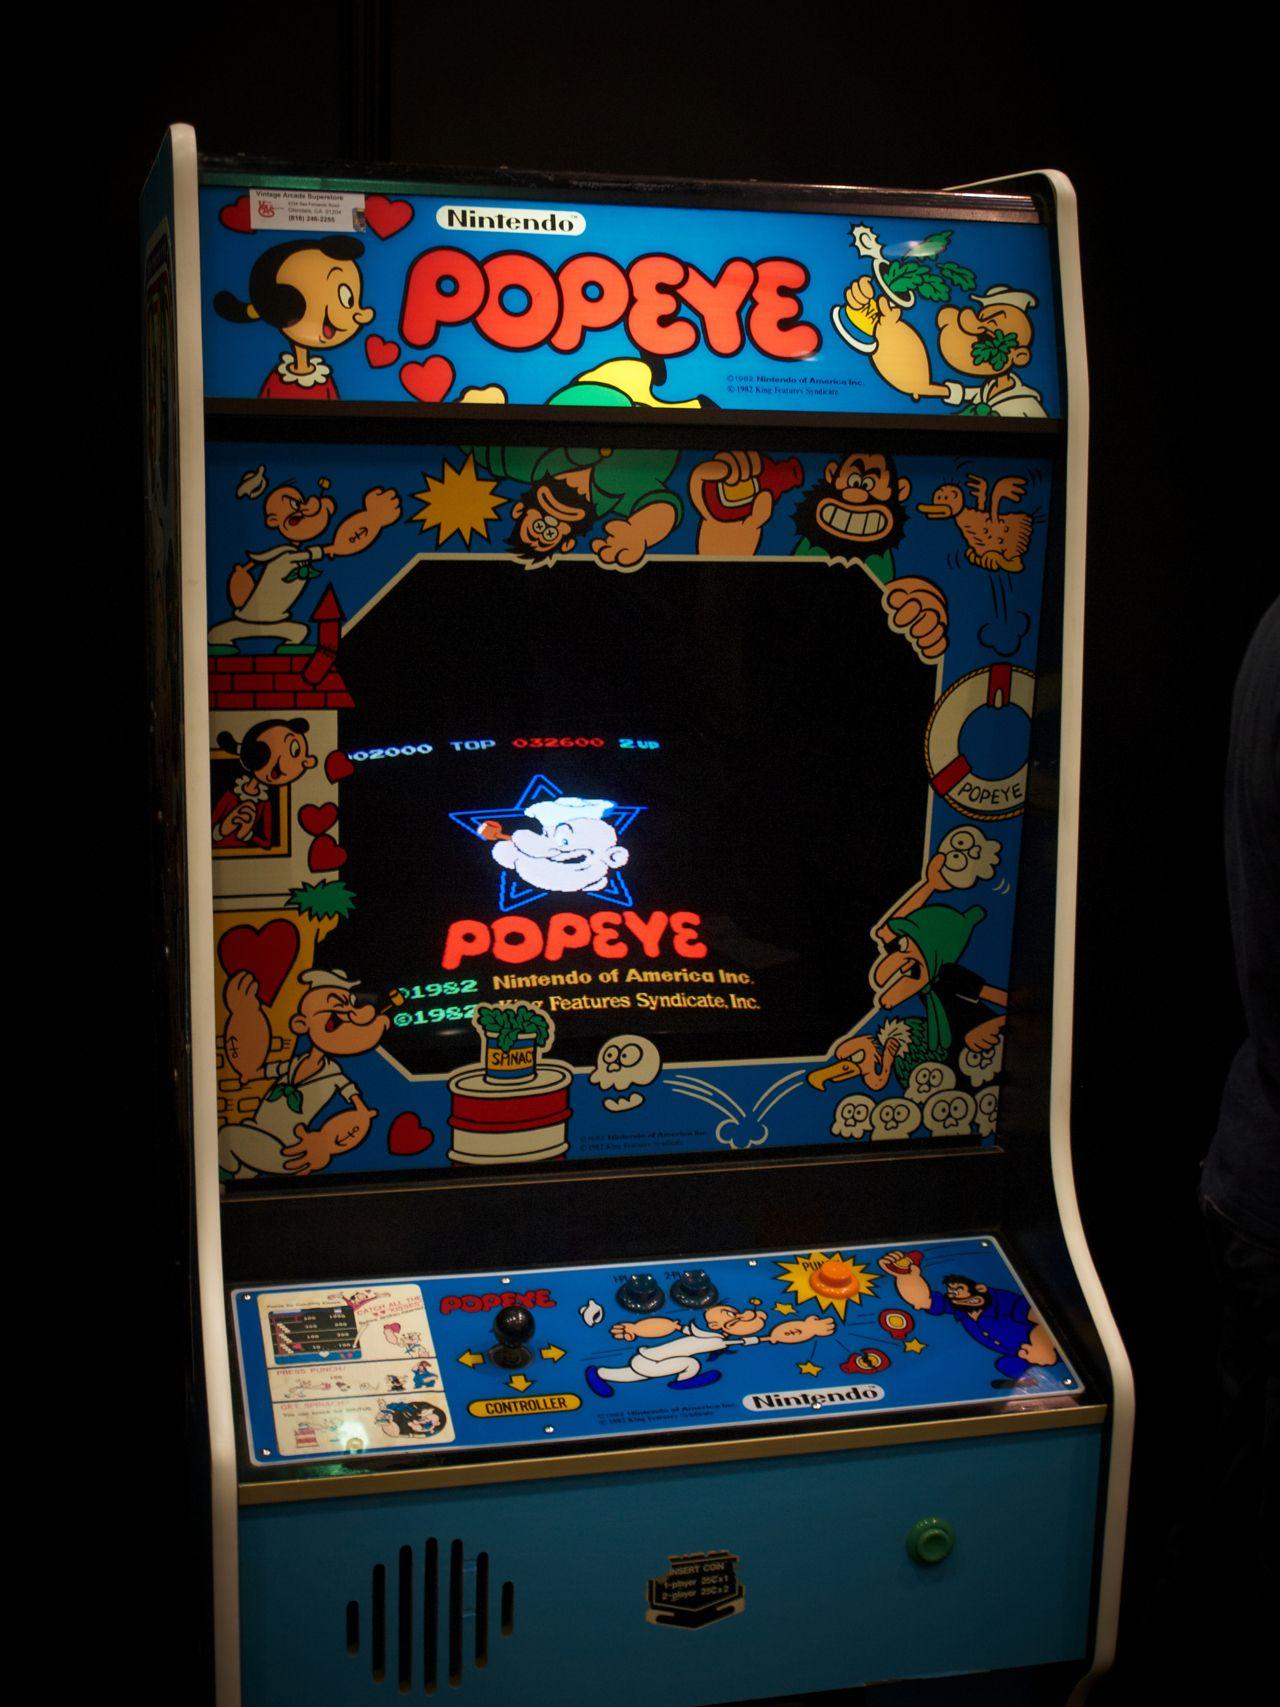 Popeye! At E3 2012 nintendo popeye arcade vintage